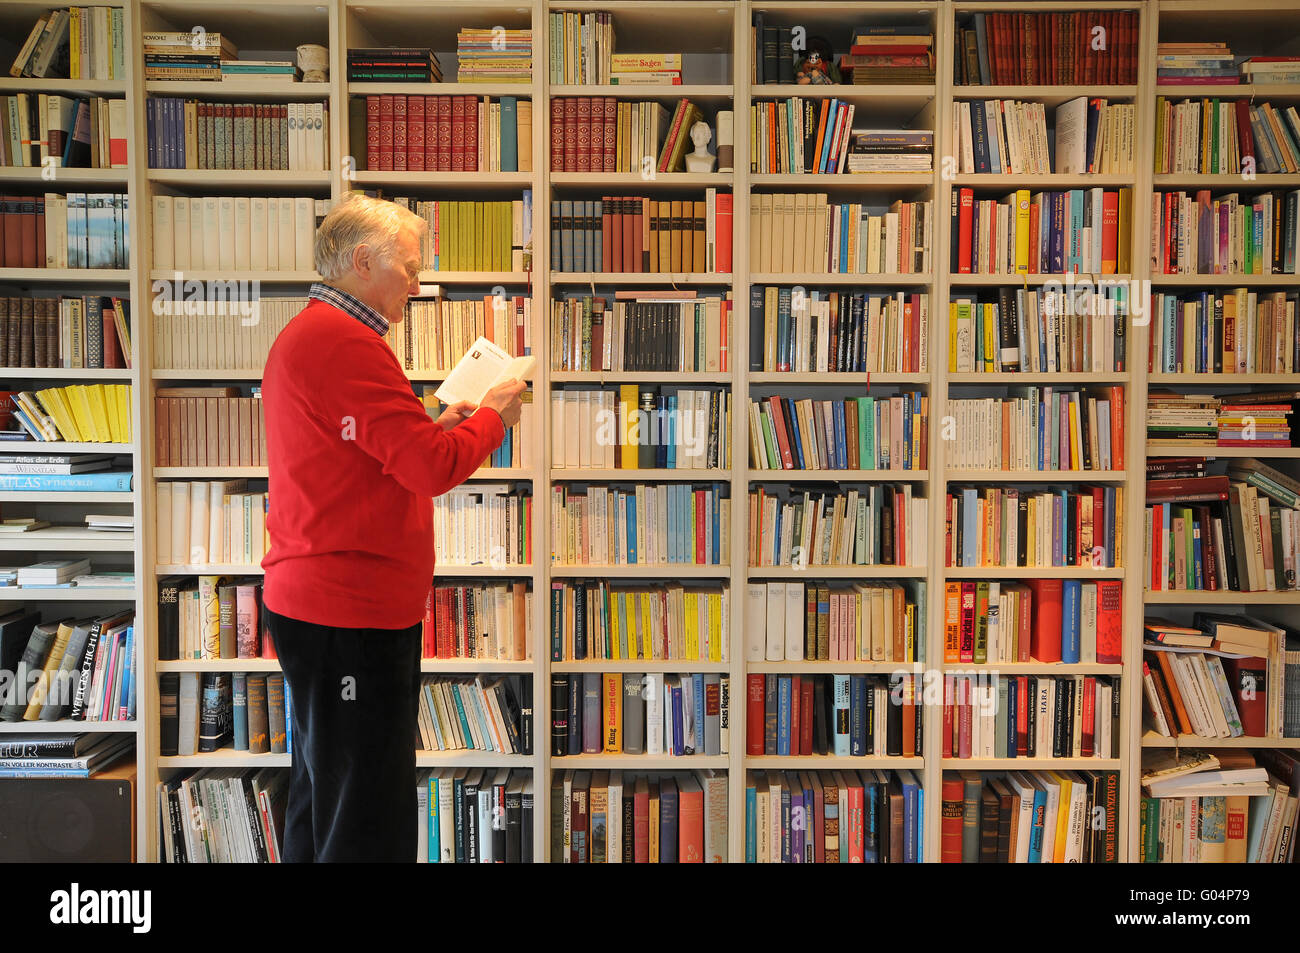 Regal mit Büchern Stockbild